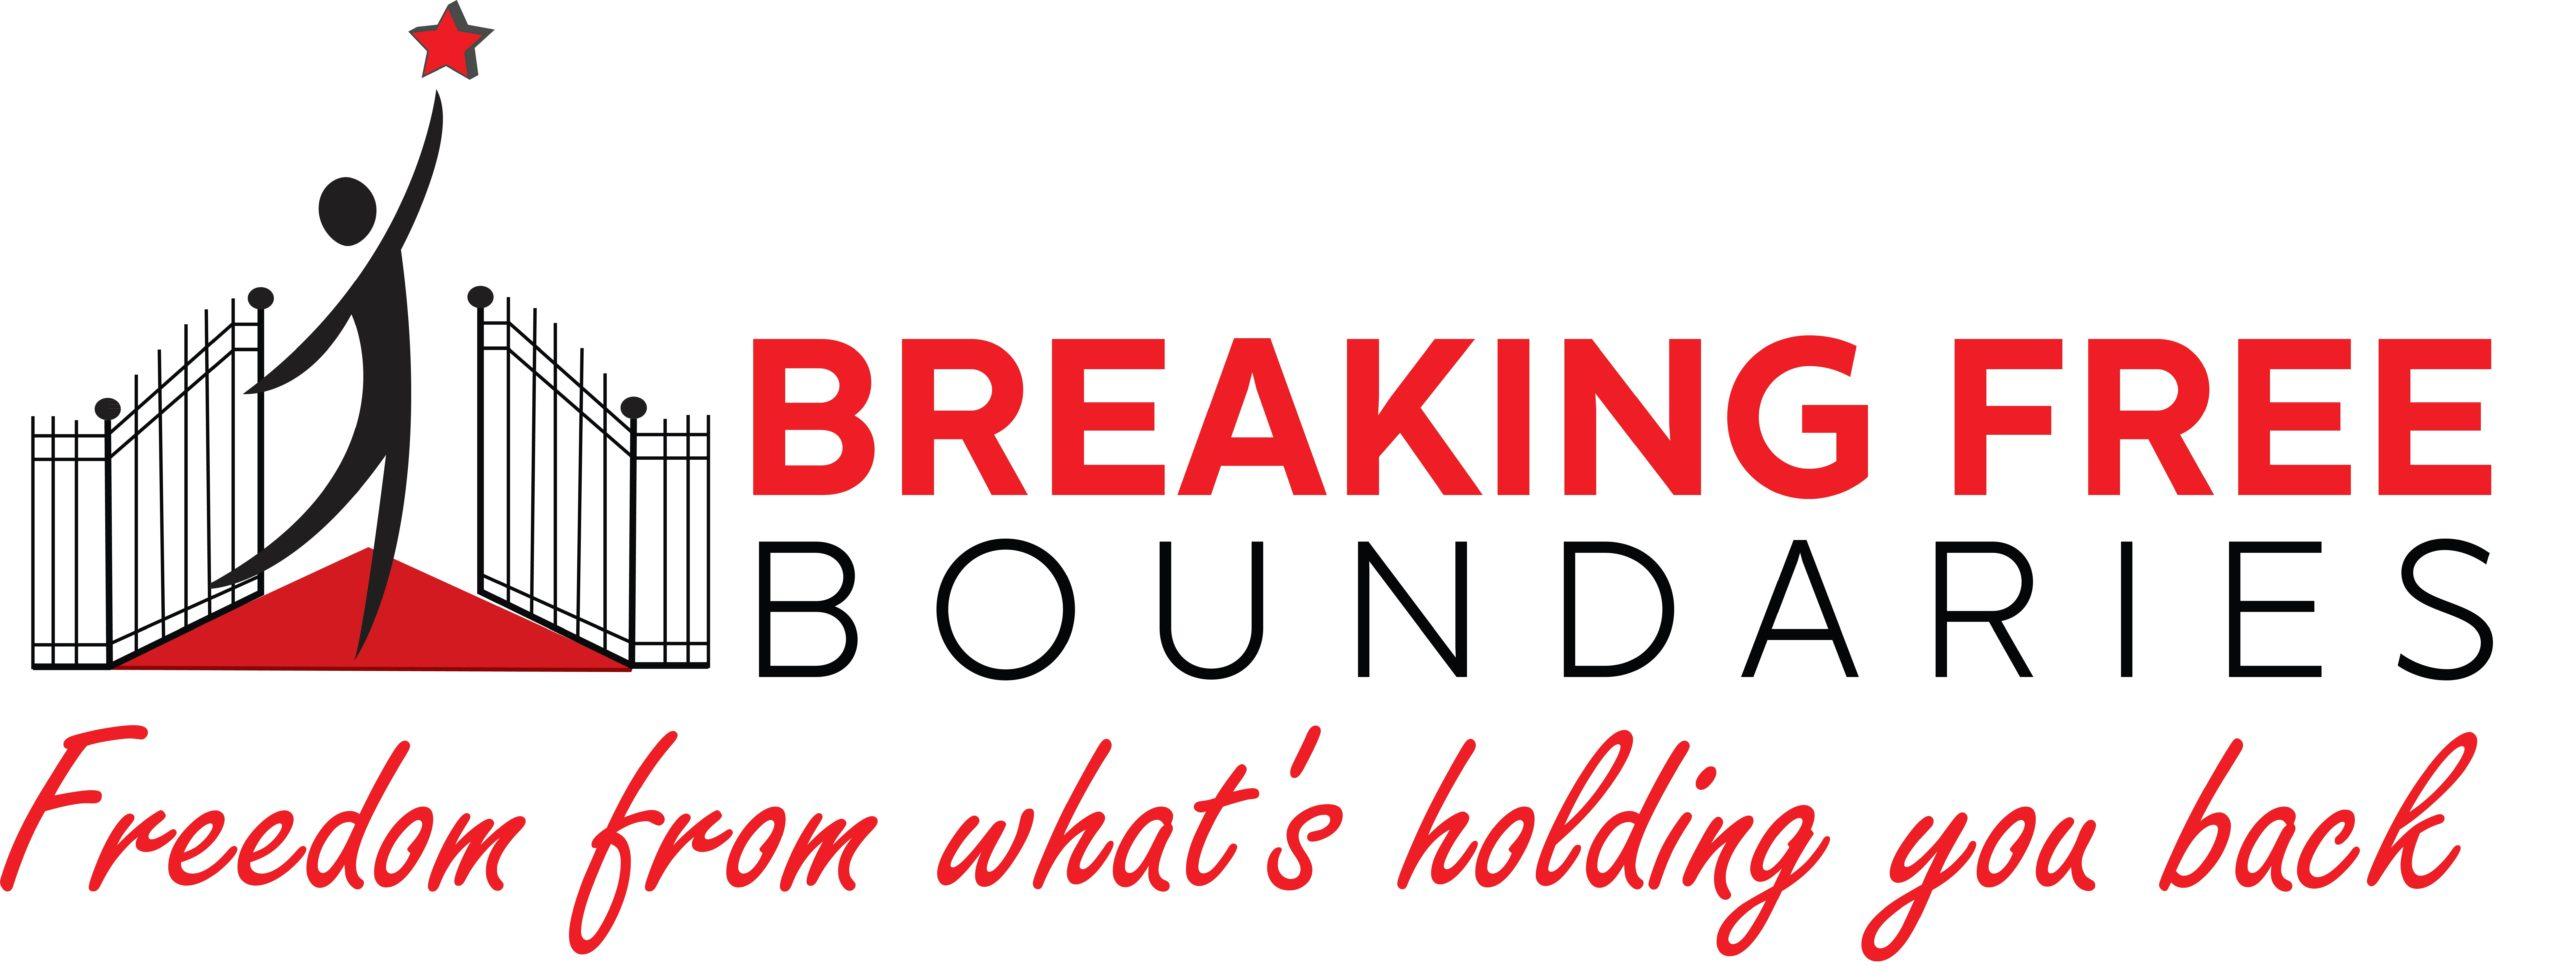 Breaking Free Boundaries